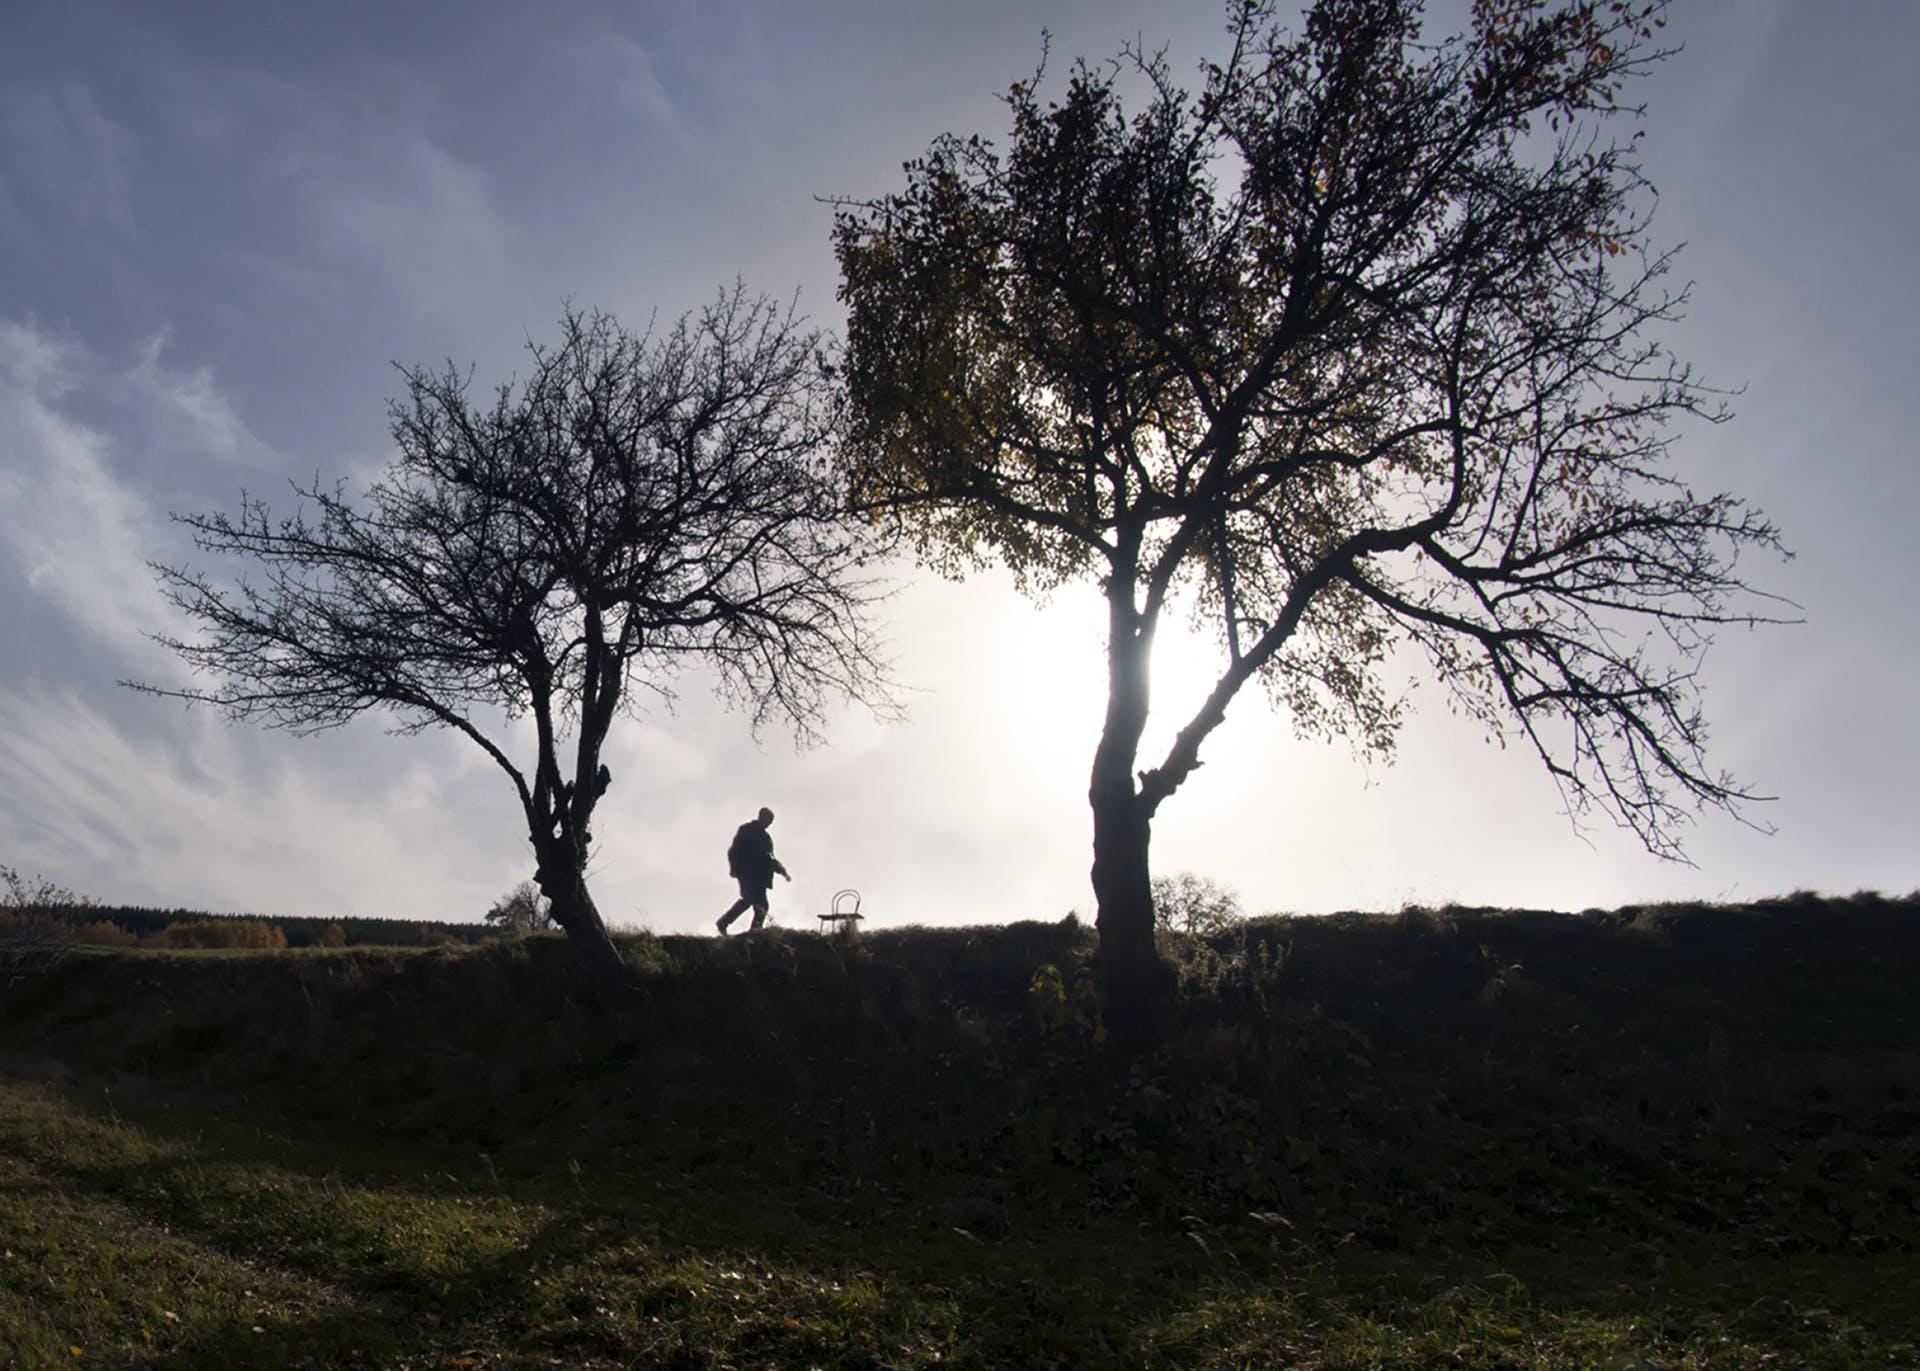 Black Tree in Land